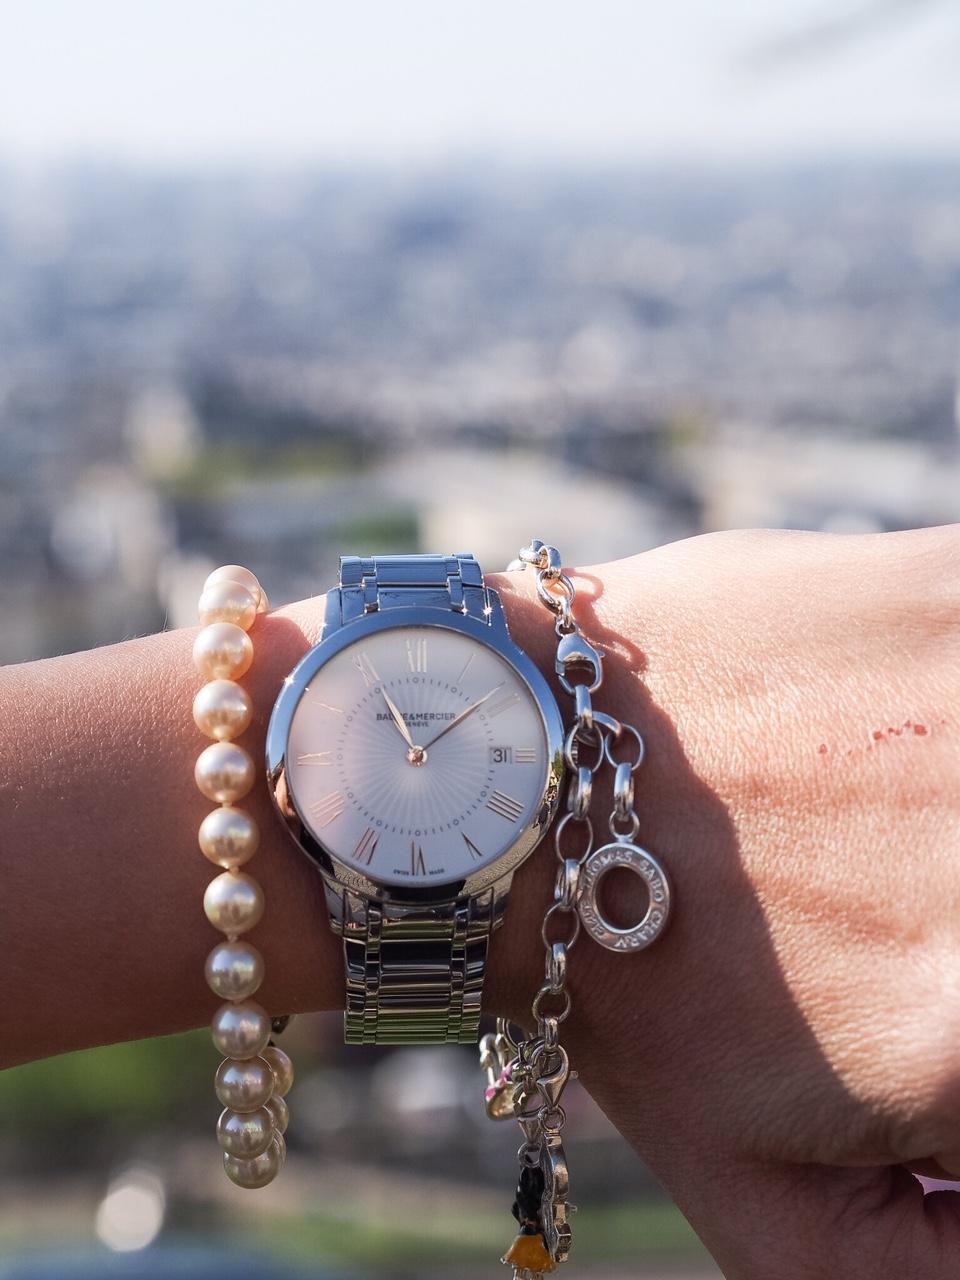 baume&mercier lebanon beirut souks ivy says fashion blogger